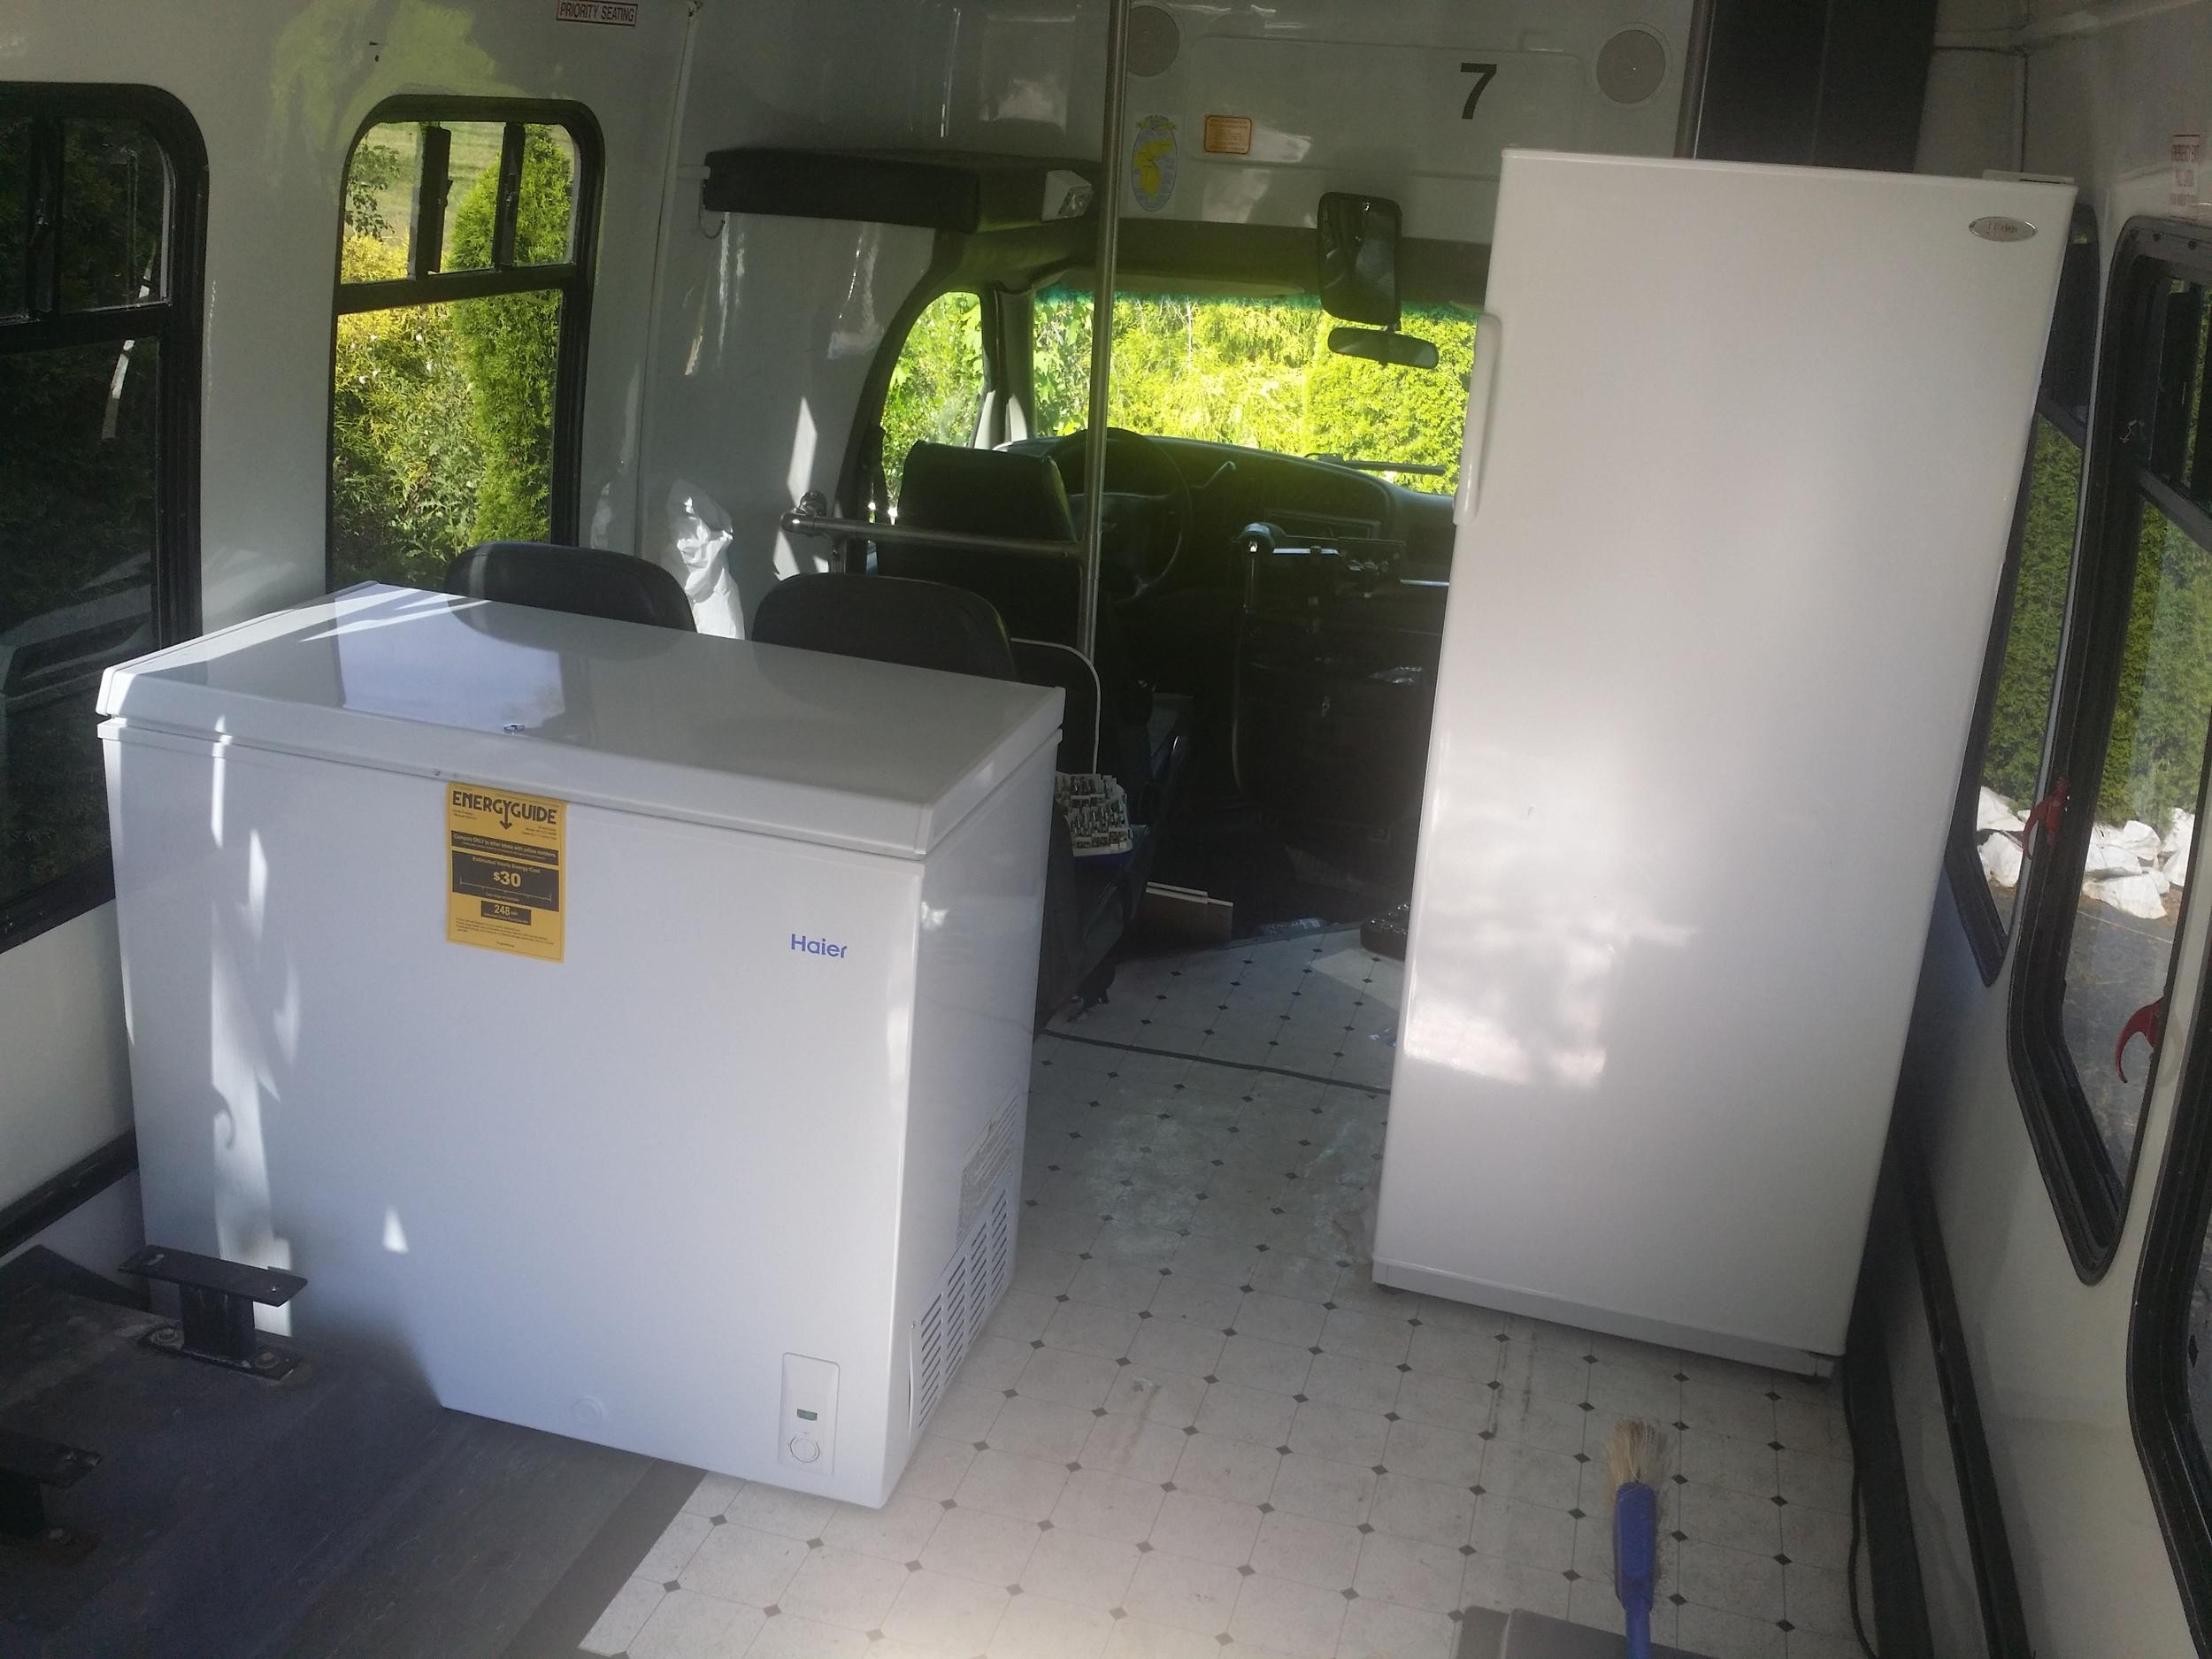 Placing the freezer and refrigerator